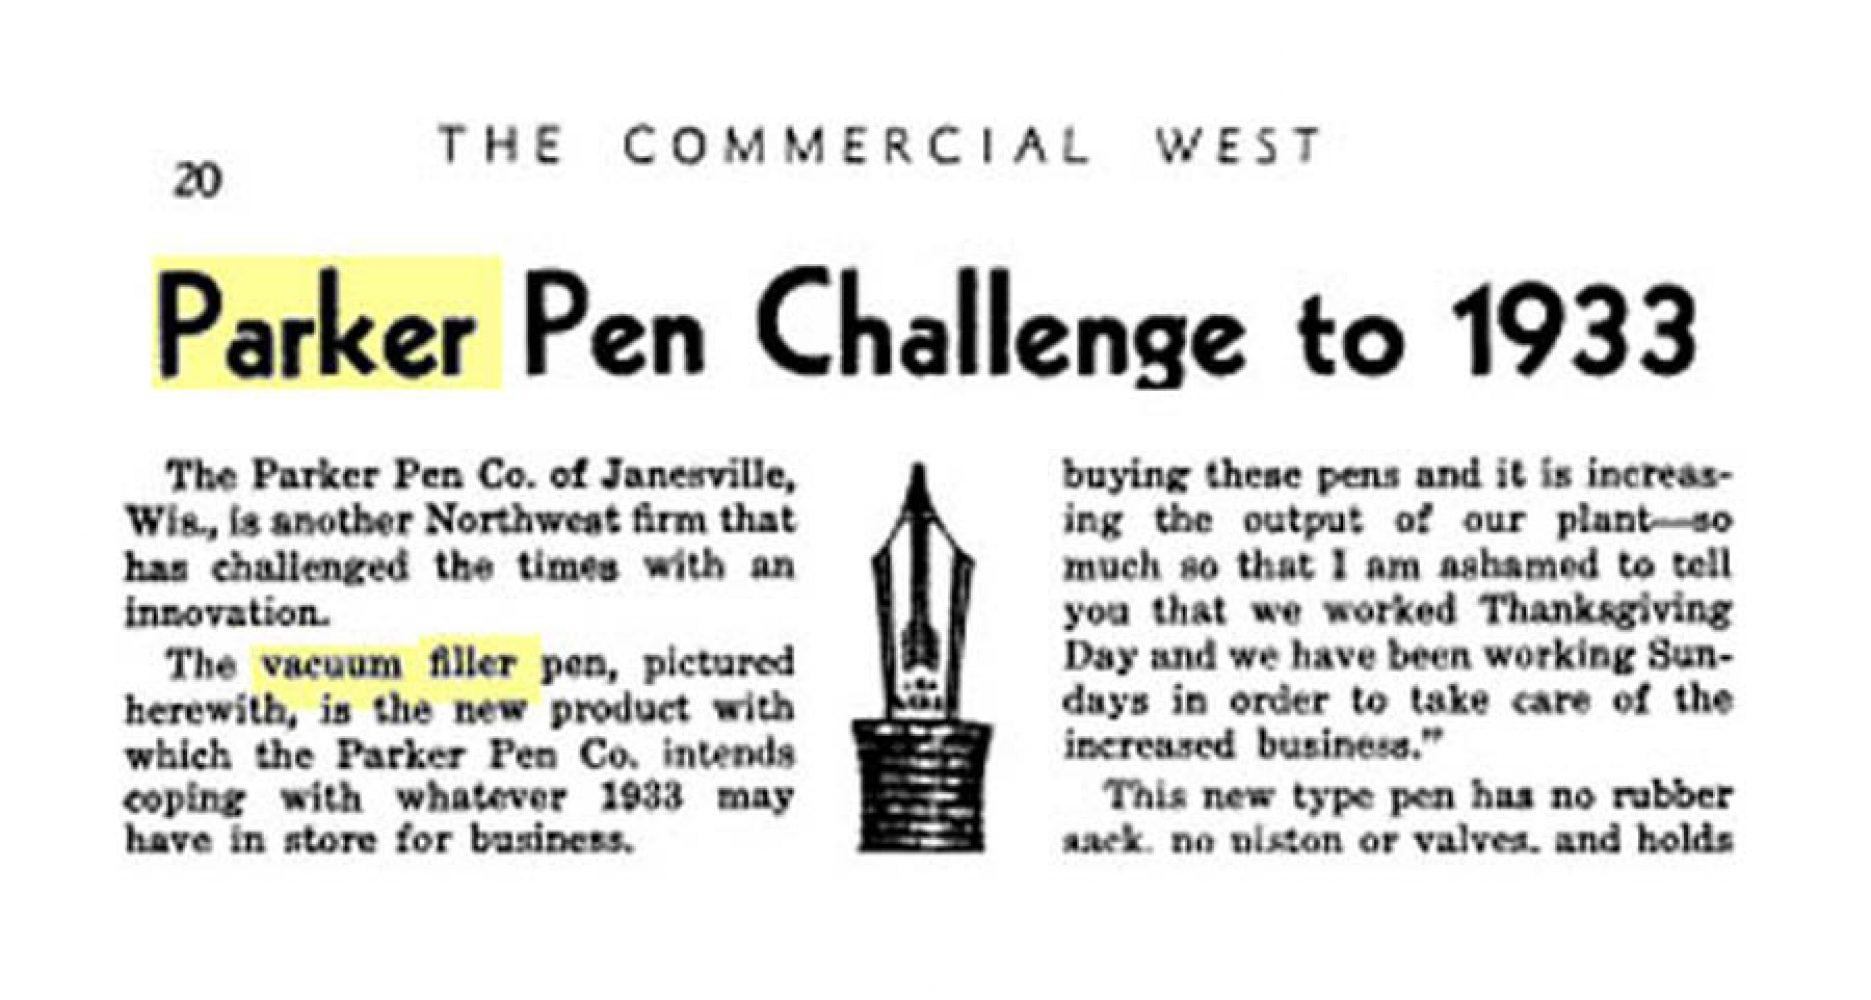 1932 12 00 Vacuum Filler Commercial West